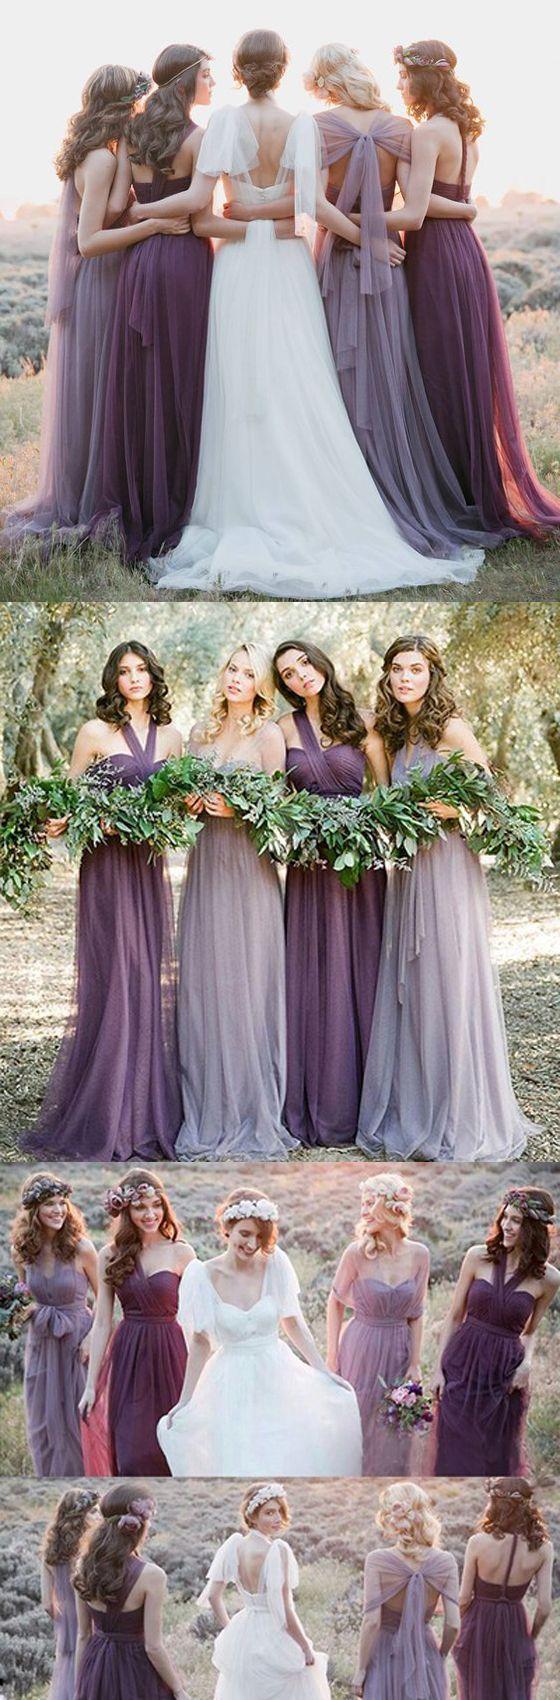 Long bridesmaid dress, tulle bridesmaid dress, convertible bridesmaid dress, elegant bridesmaid dress, popular bridesmaid dress